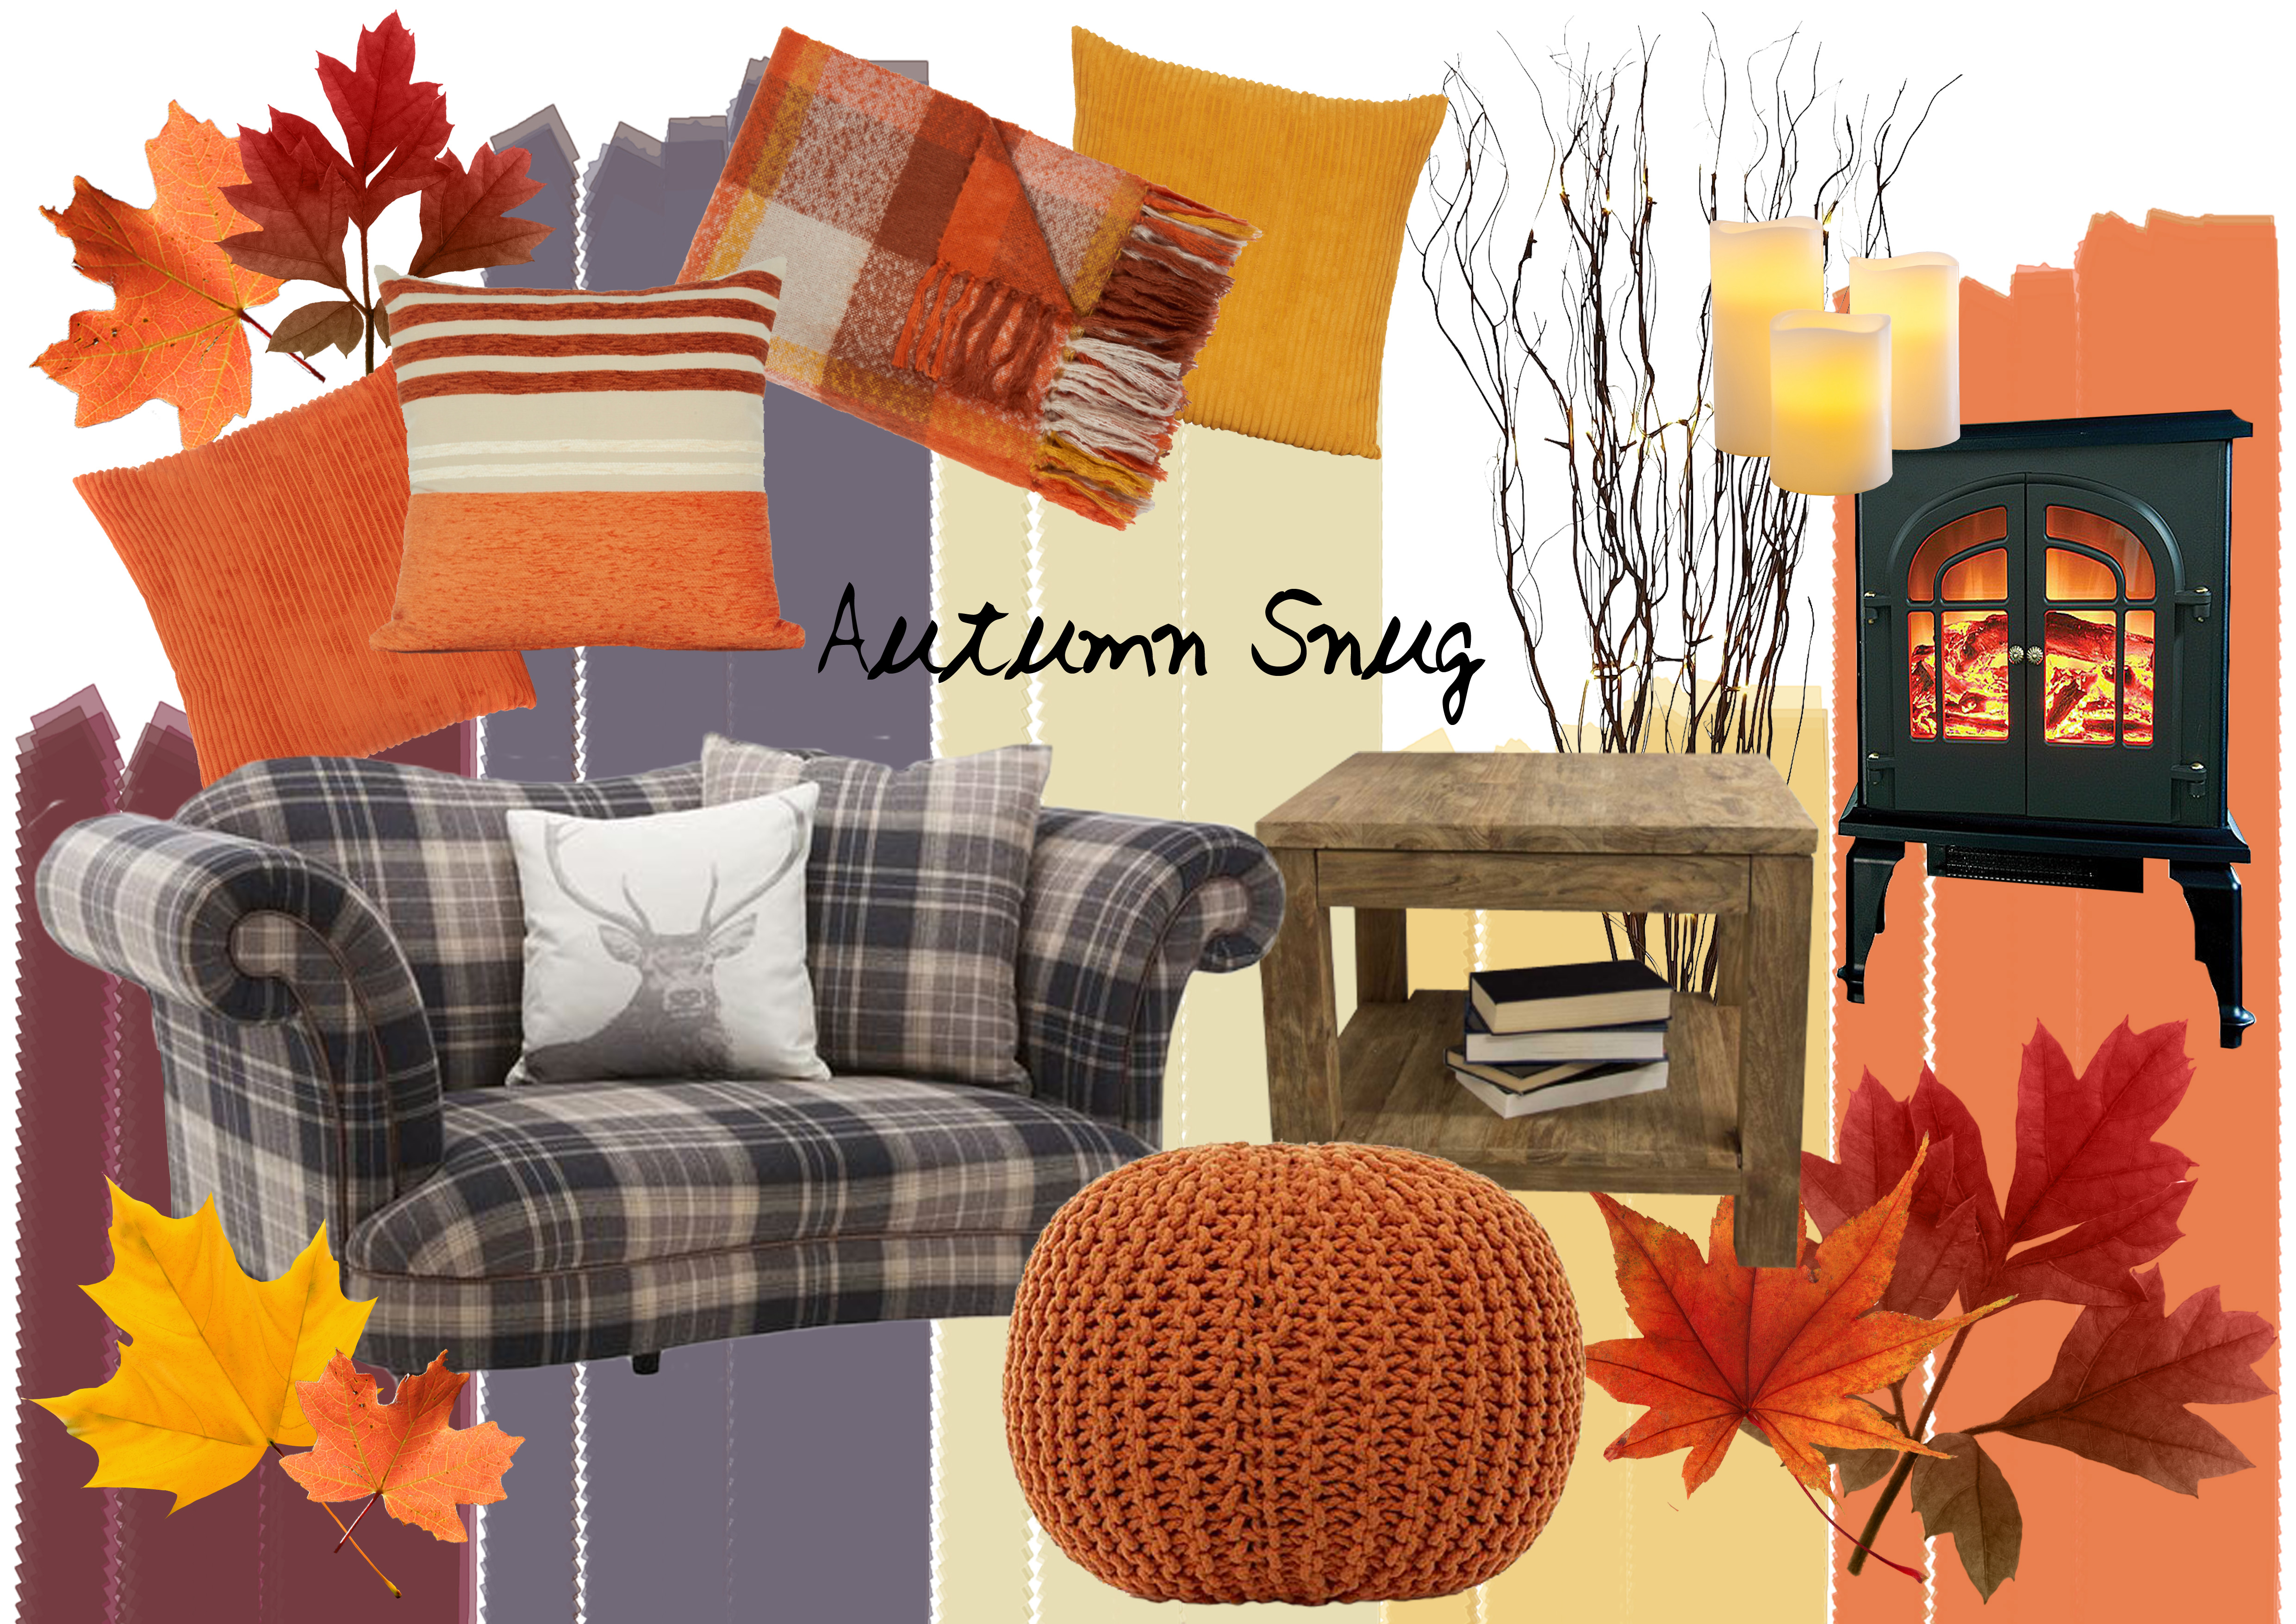 Autumn Snug - Mood Board for Autumn Decor